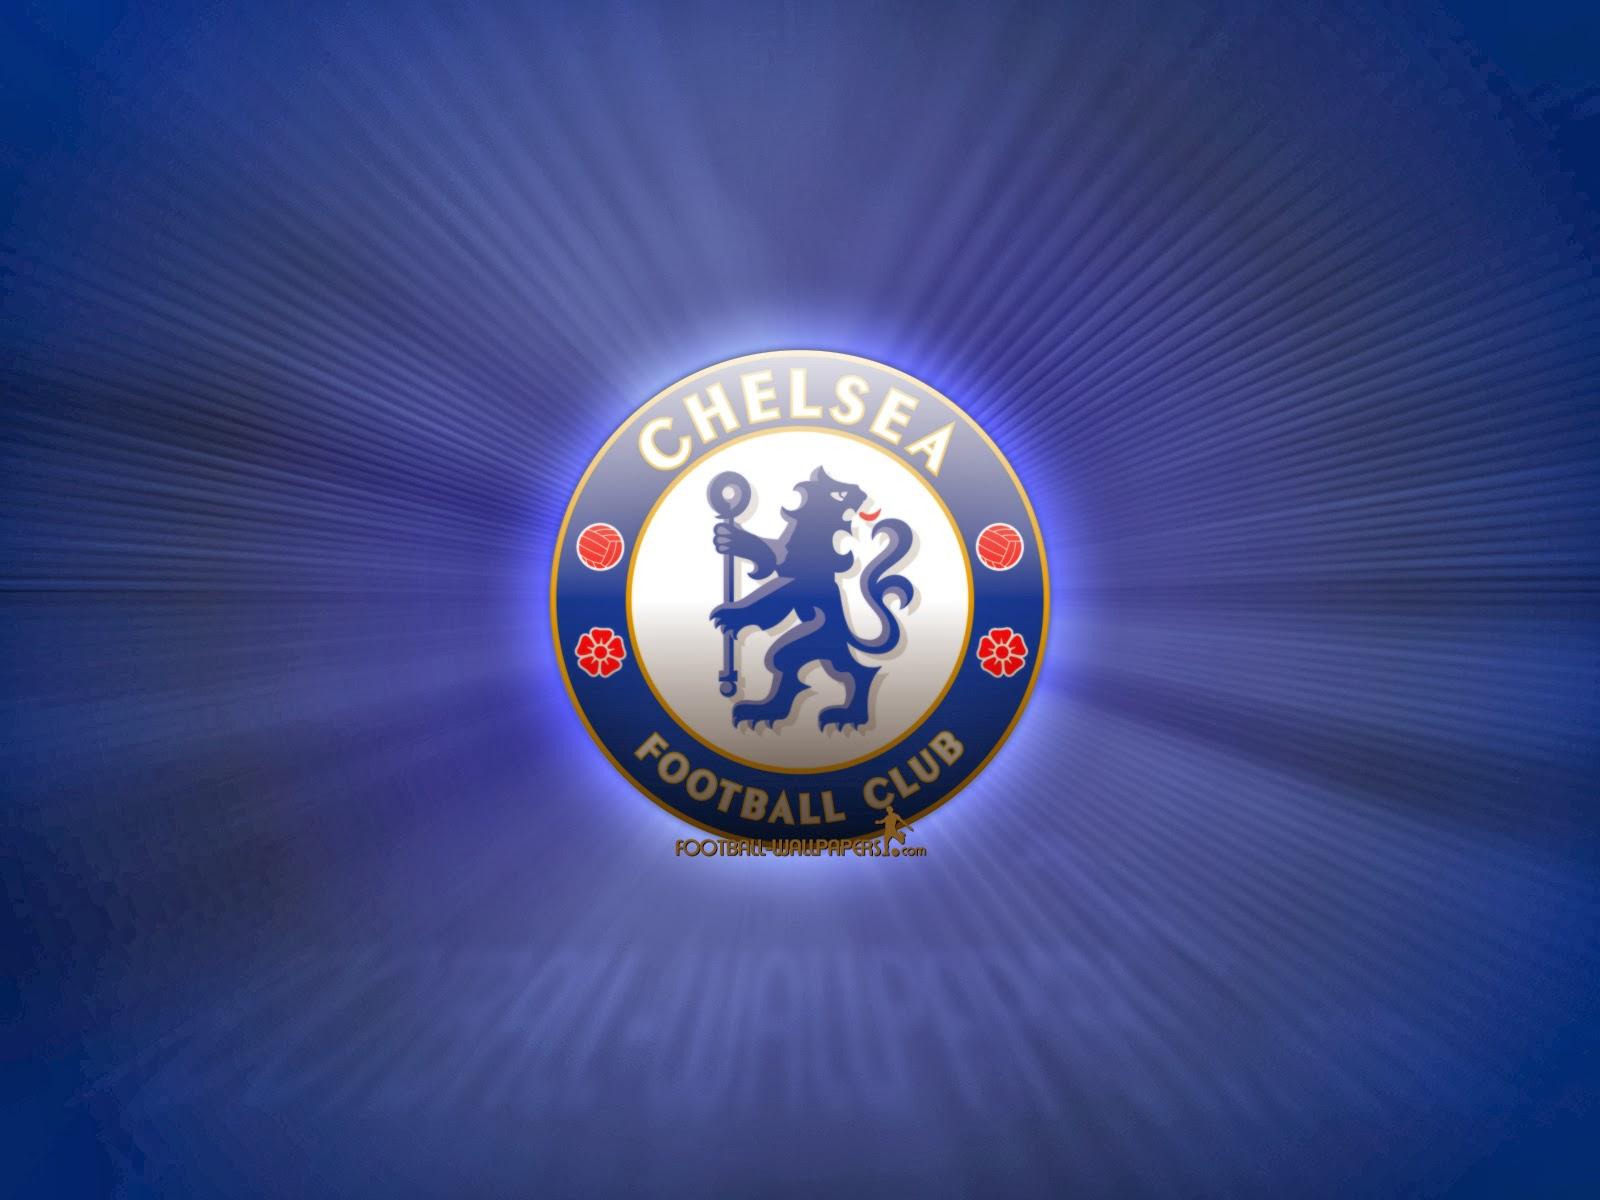 Logo Chelsea Football Club